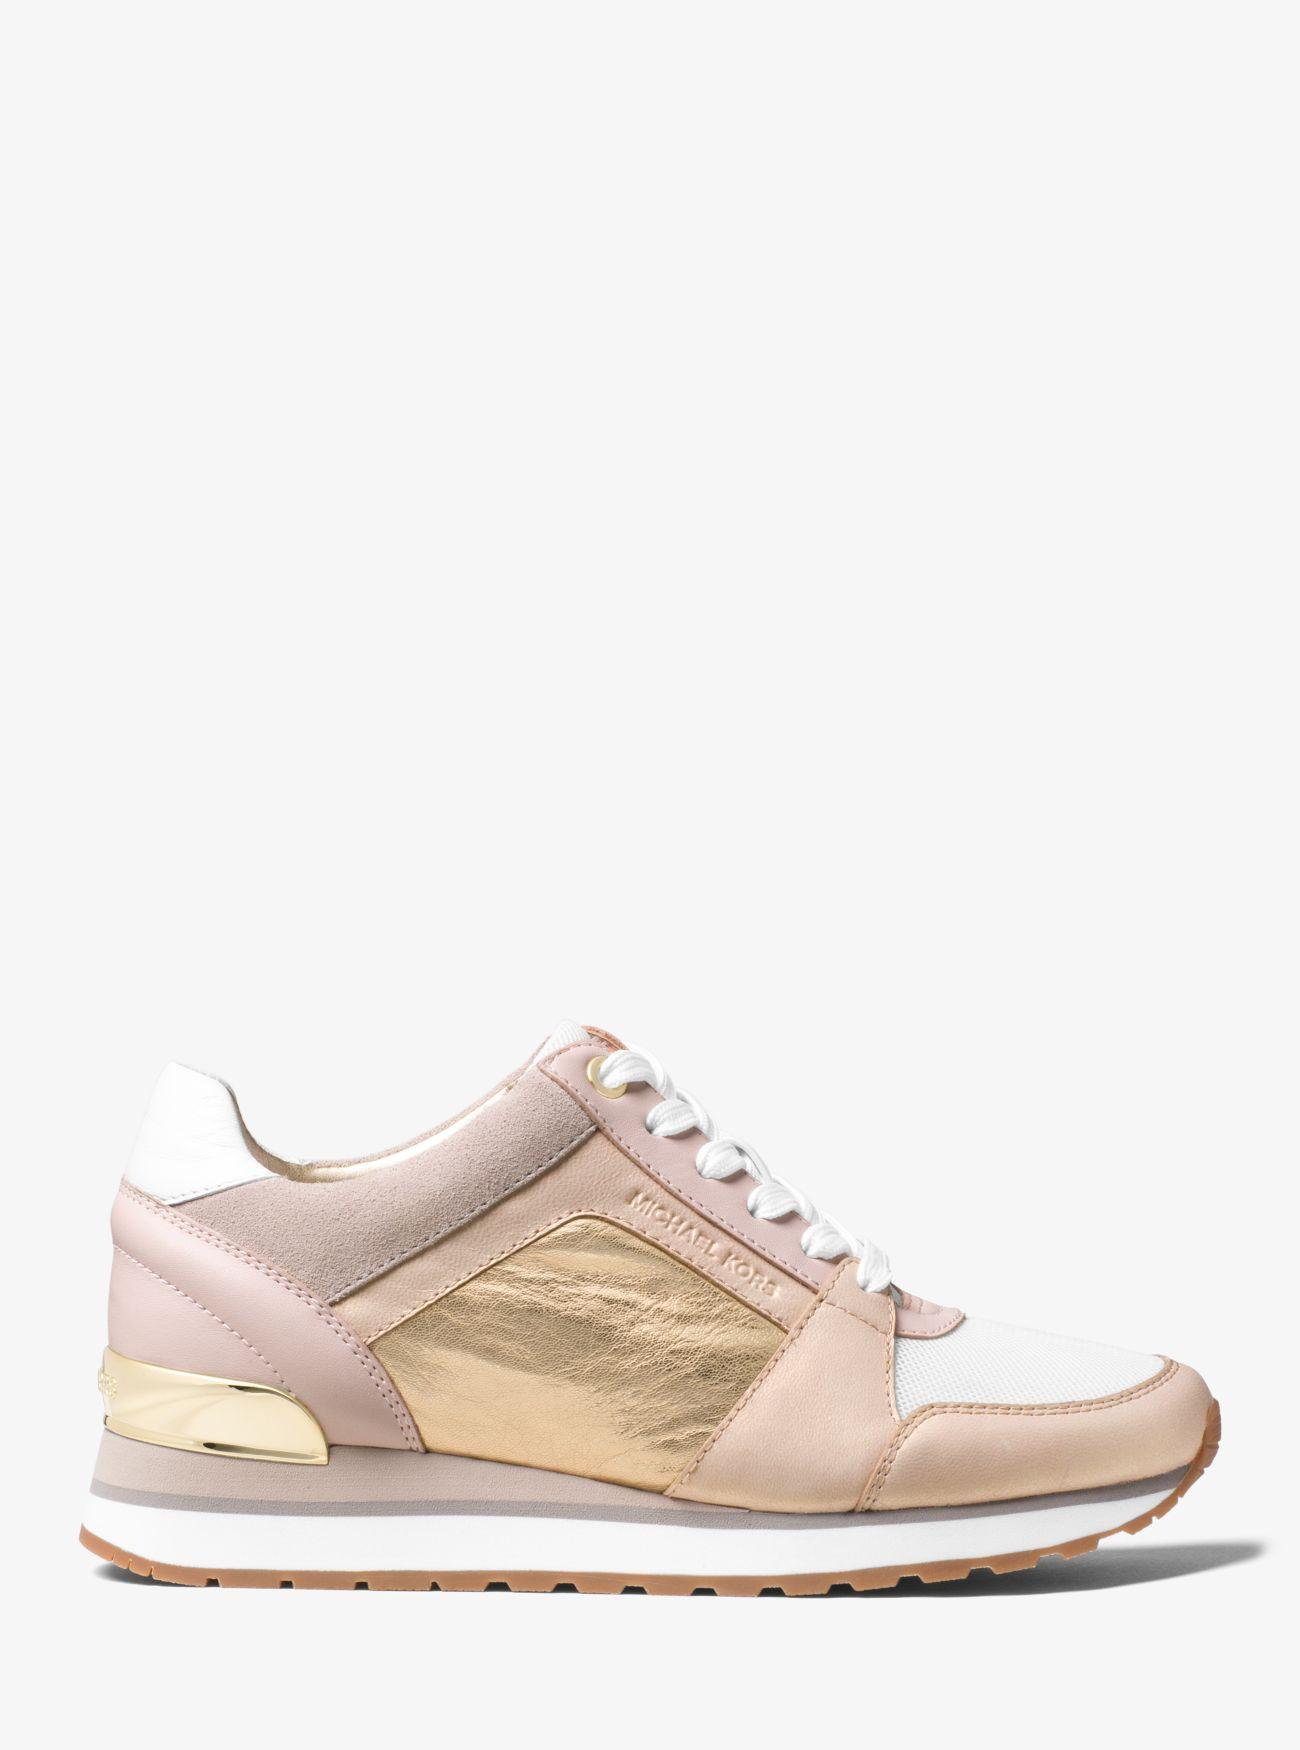 Michael Kors Billie Leather Sneaker in Pink